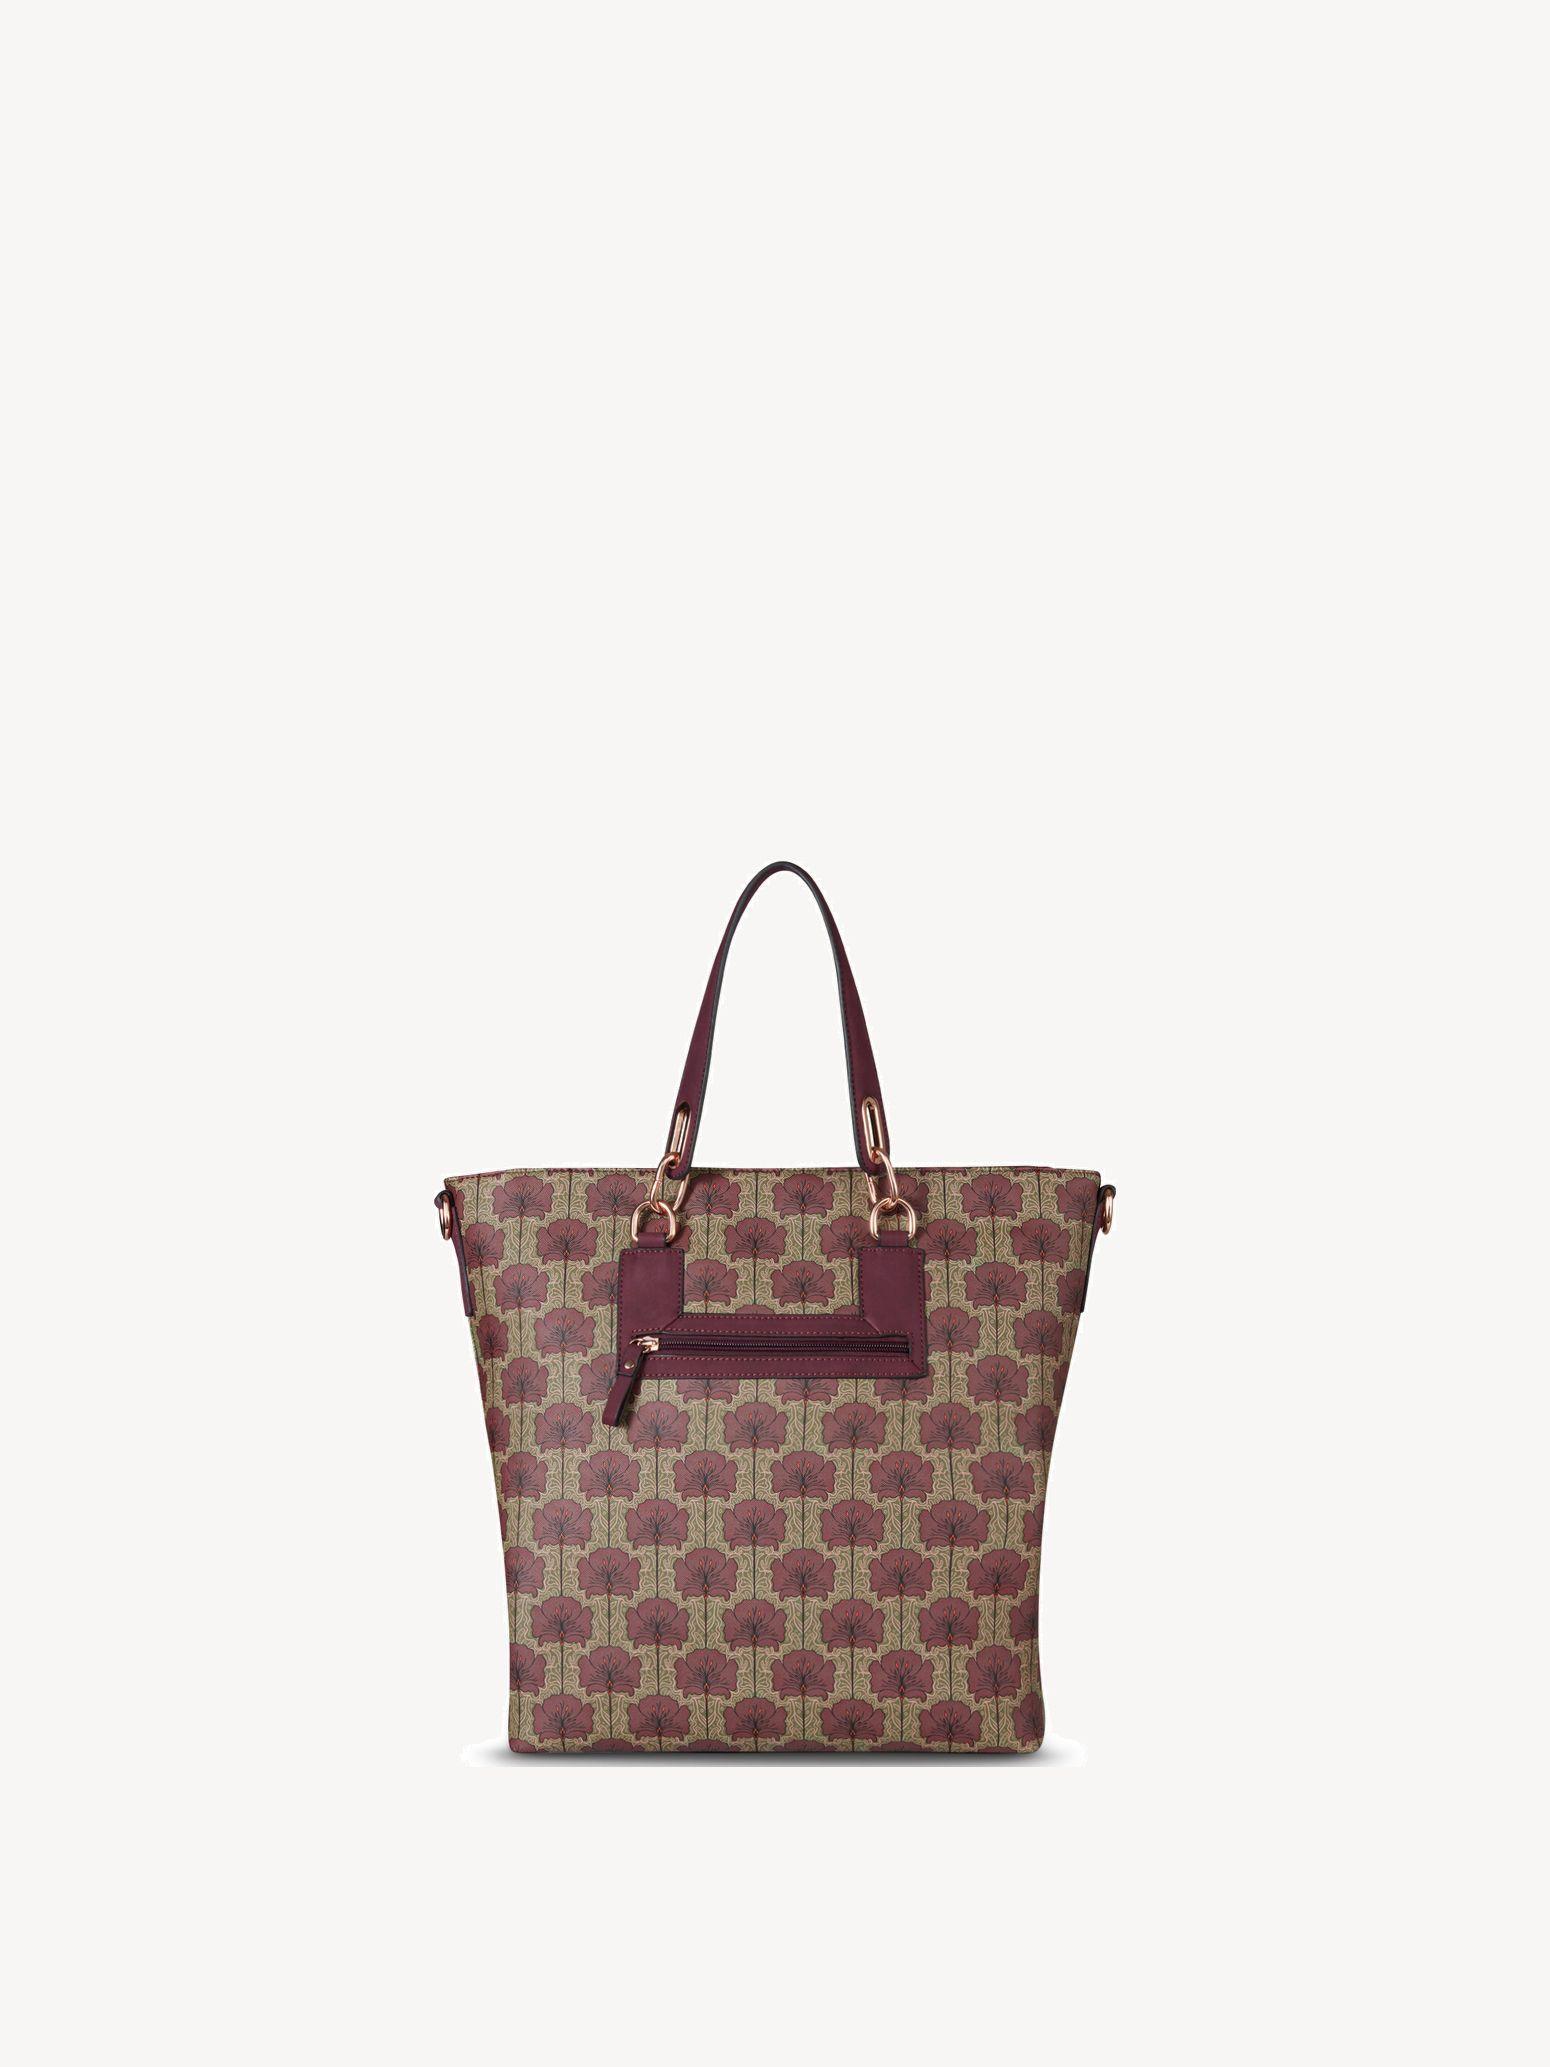 c54f8d605d13dc Fiorella 2923182-544-001  Tamaris Shopper online kaufen!